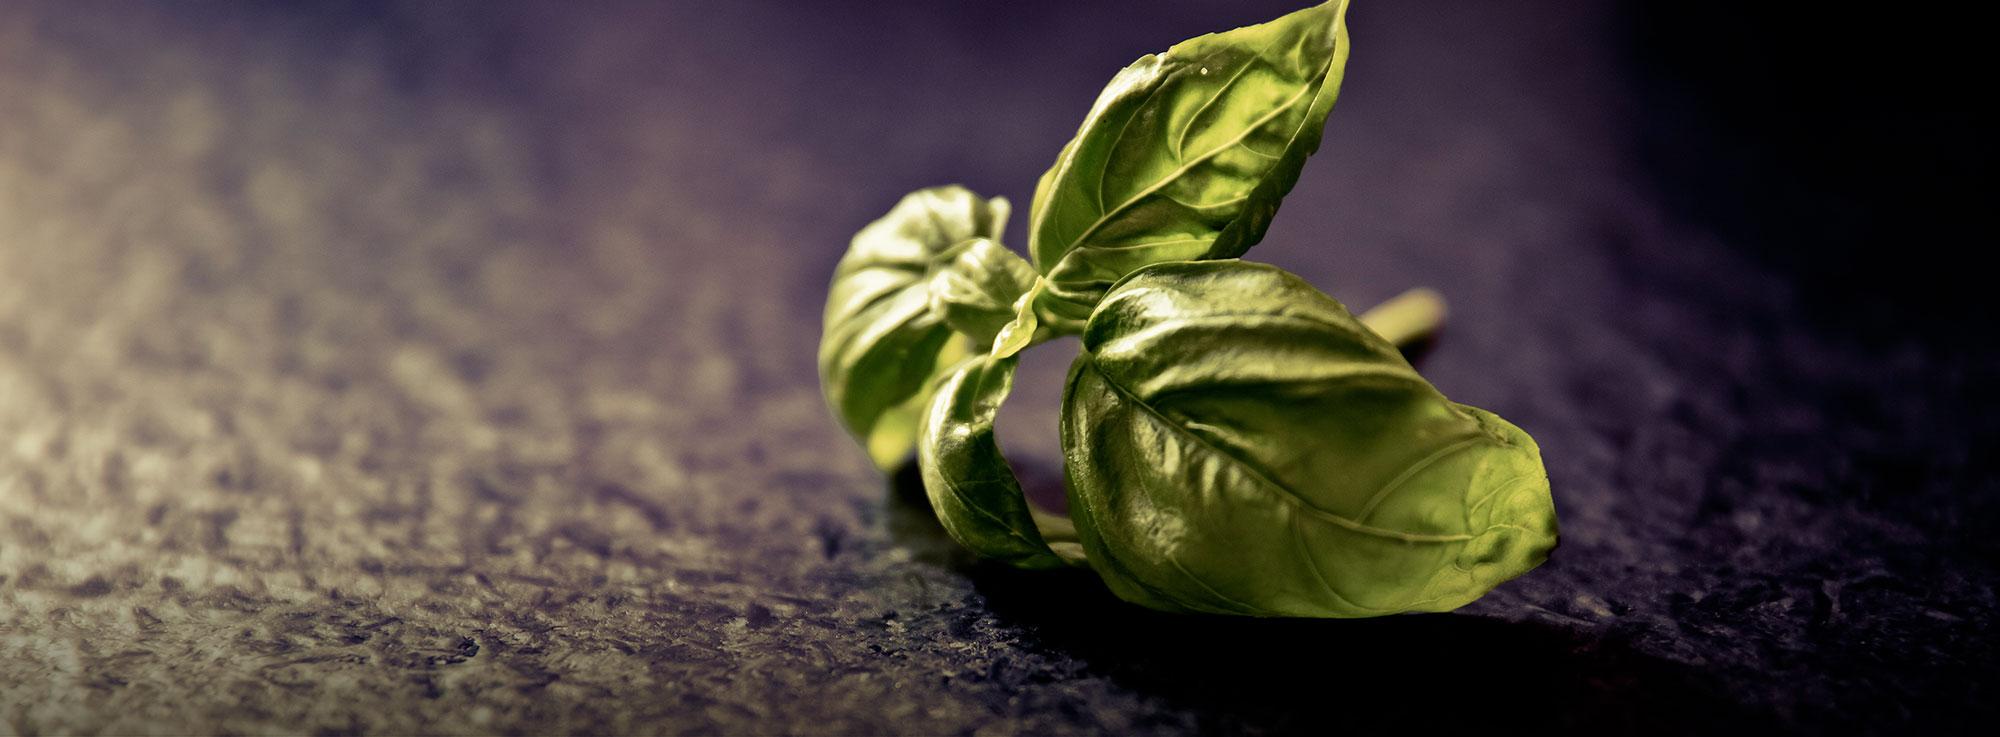 Ricetta: Liquore al Basilico